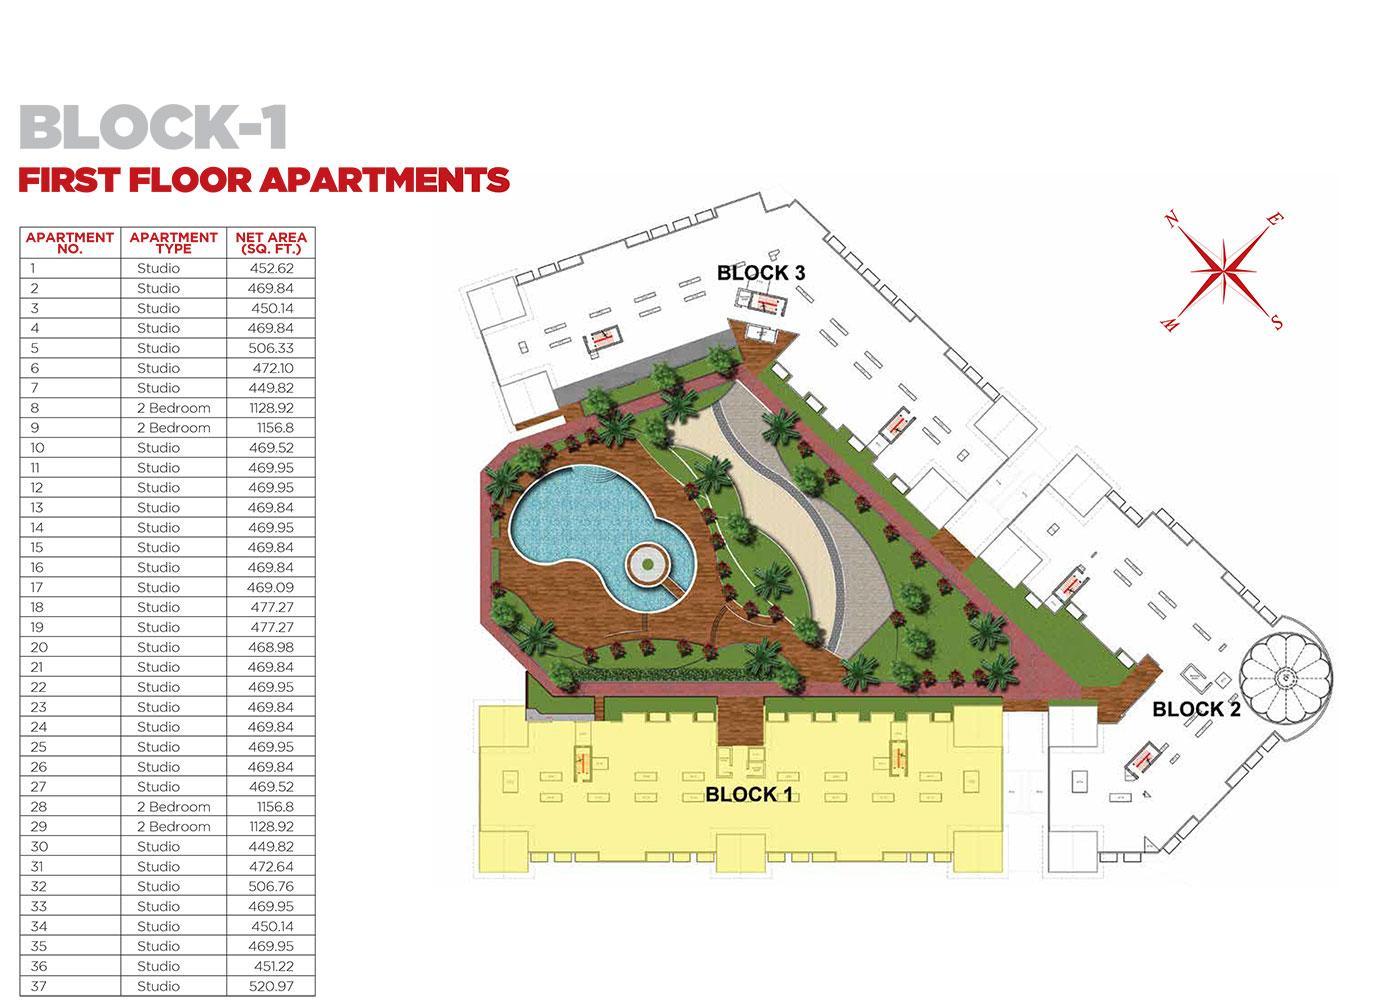 First Floor Apartments Block 1